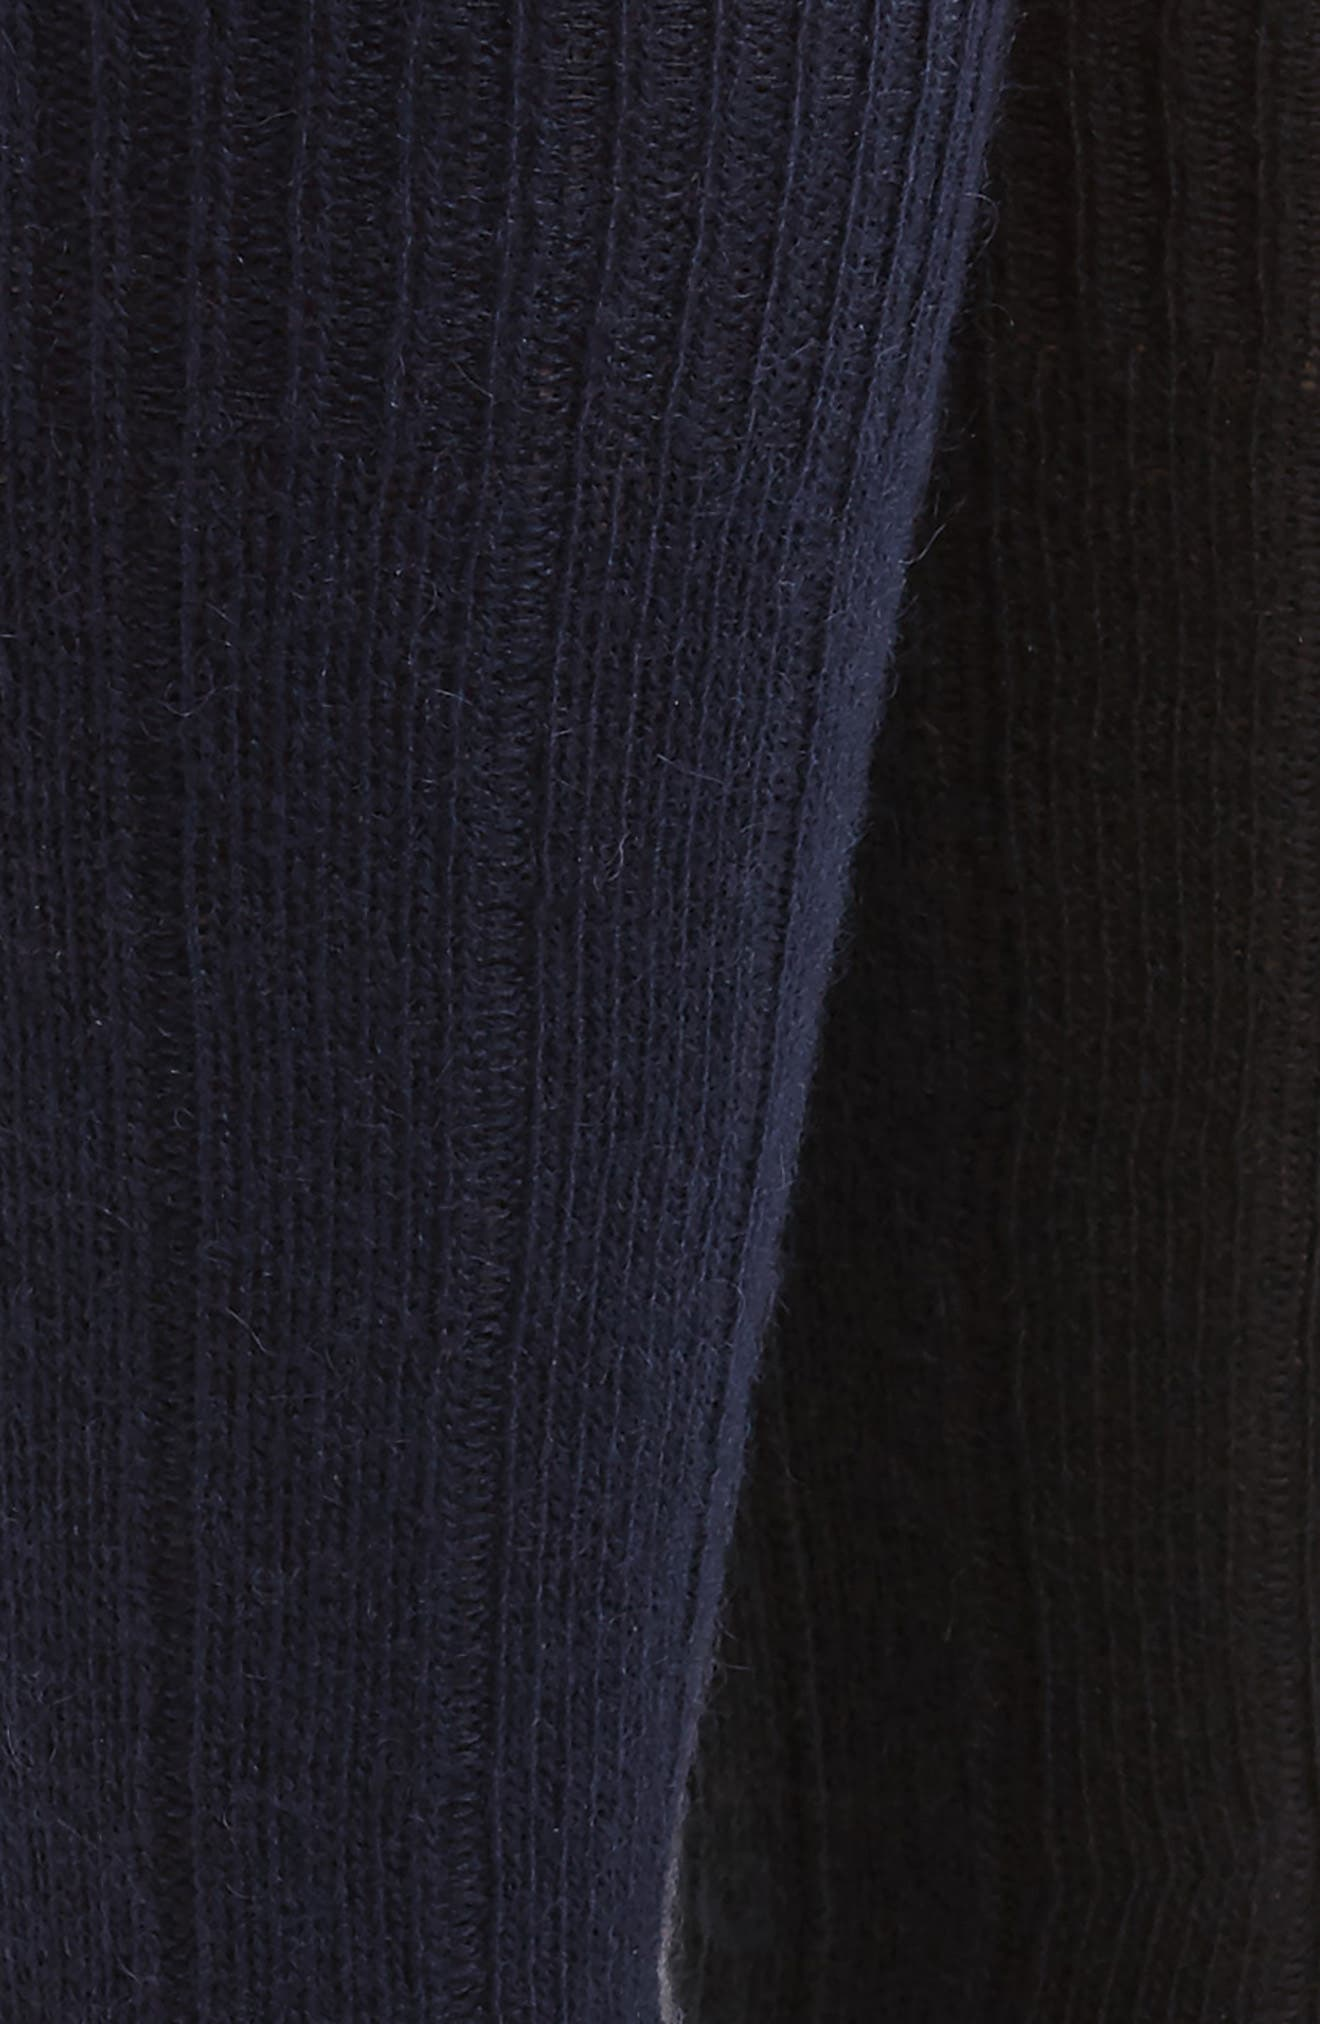 2-Pack Cashmere Blend Socks Box Set,                             Alternate thumbnail 2, color,                             001